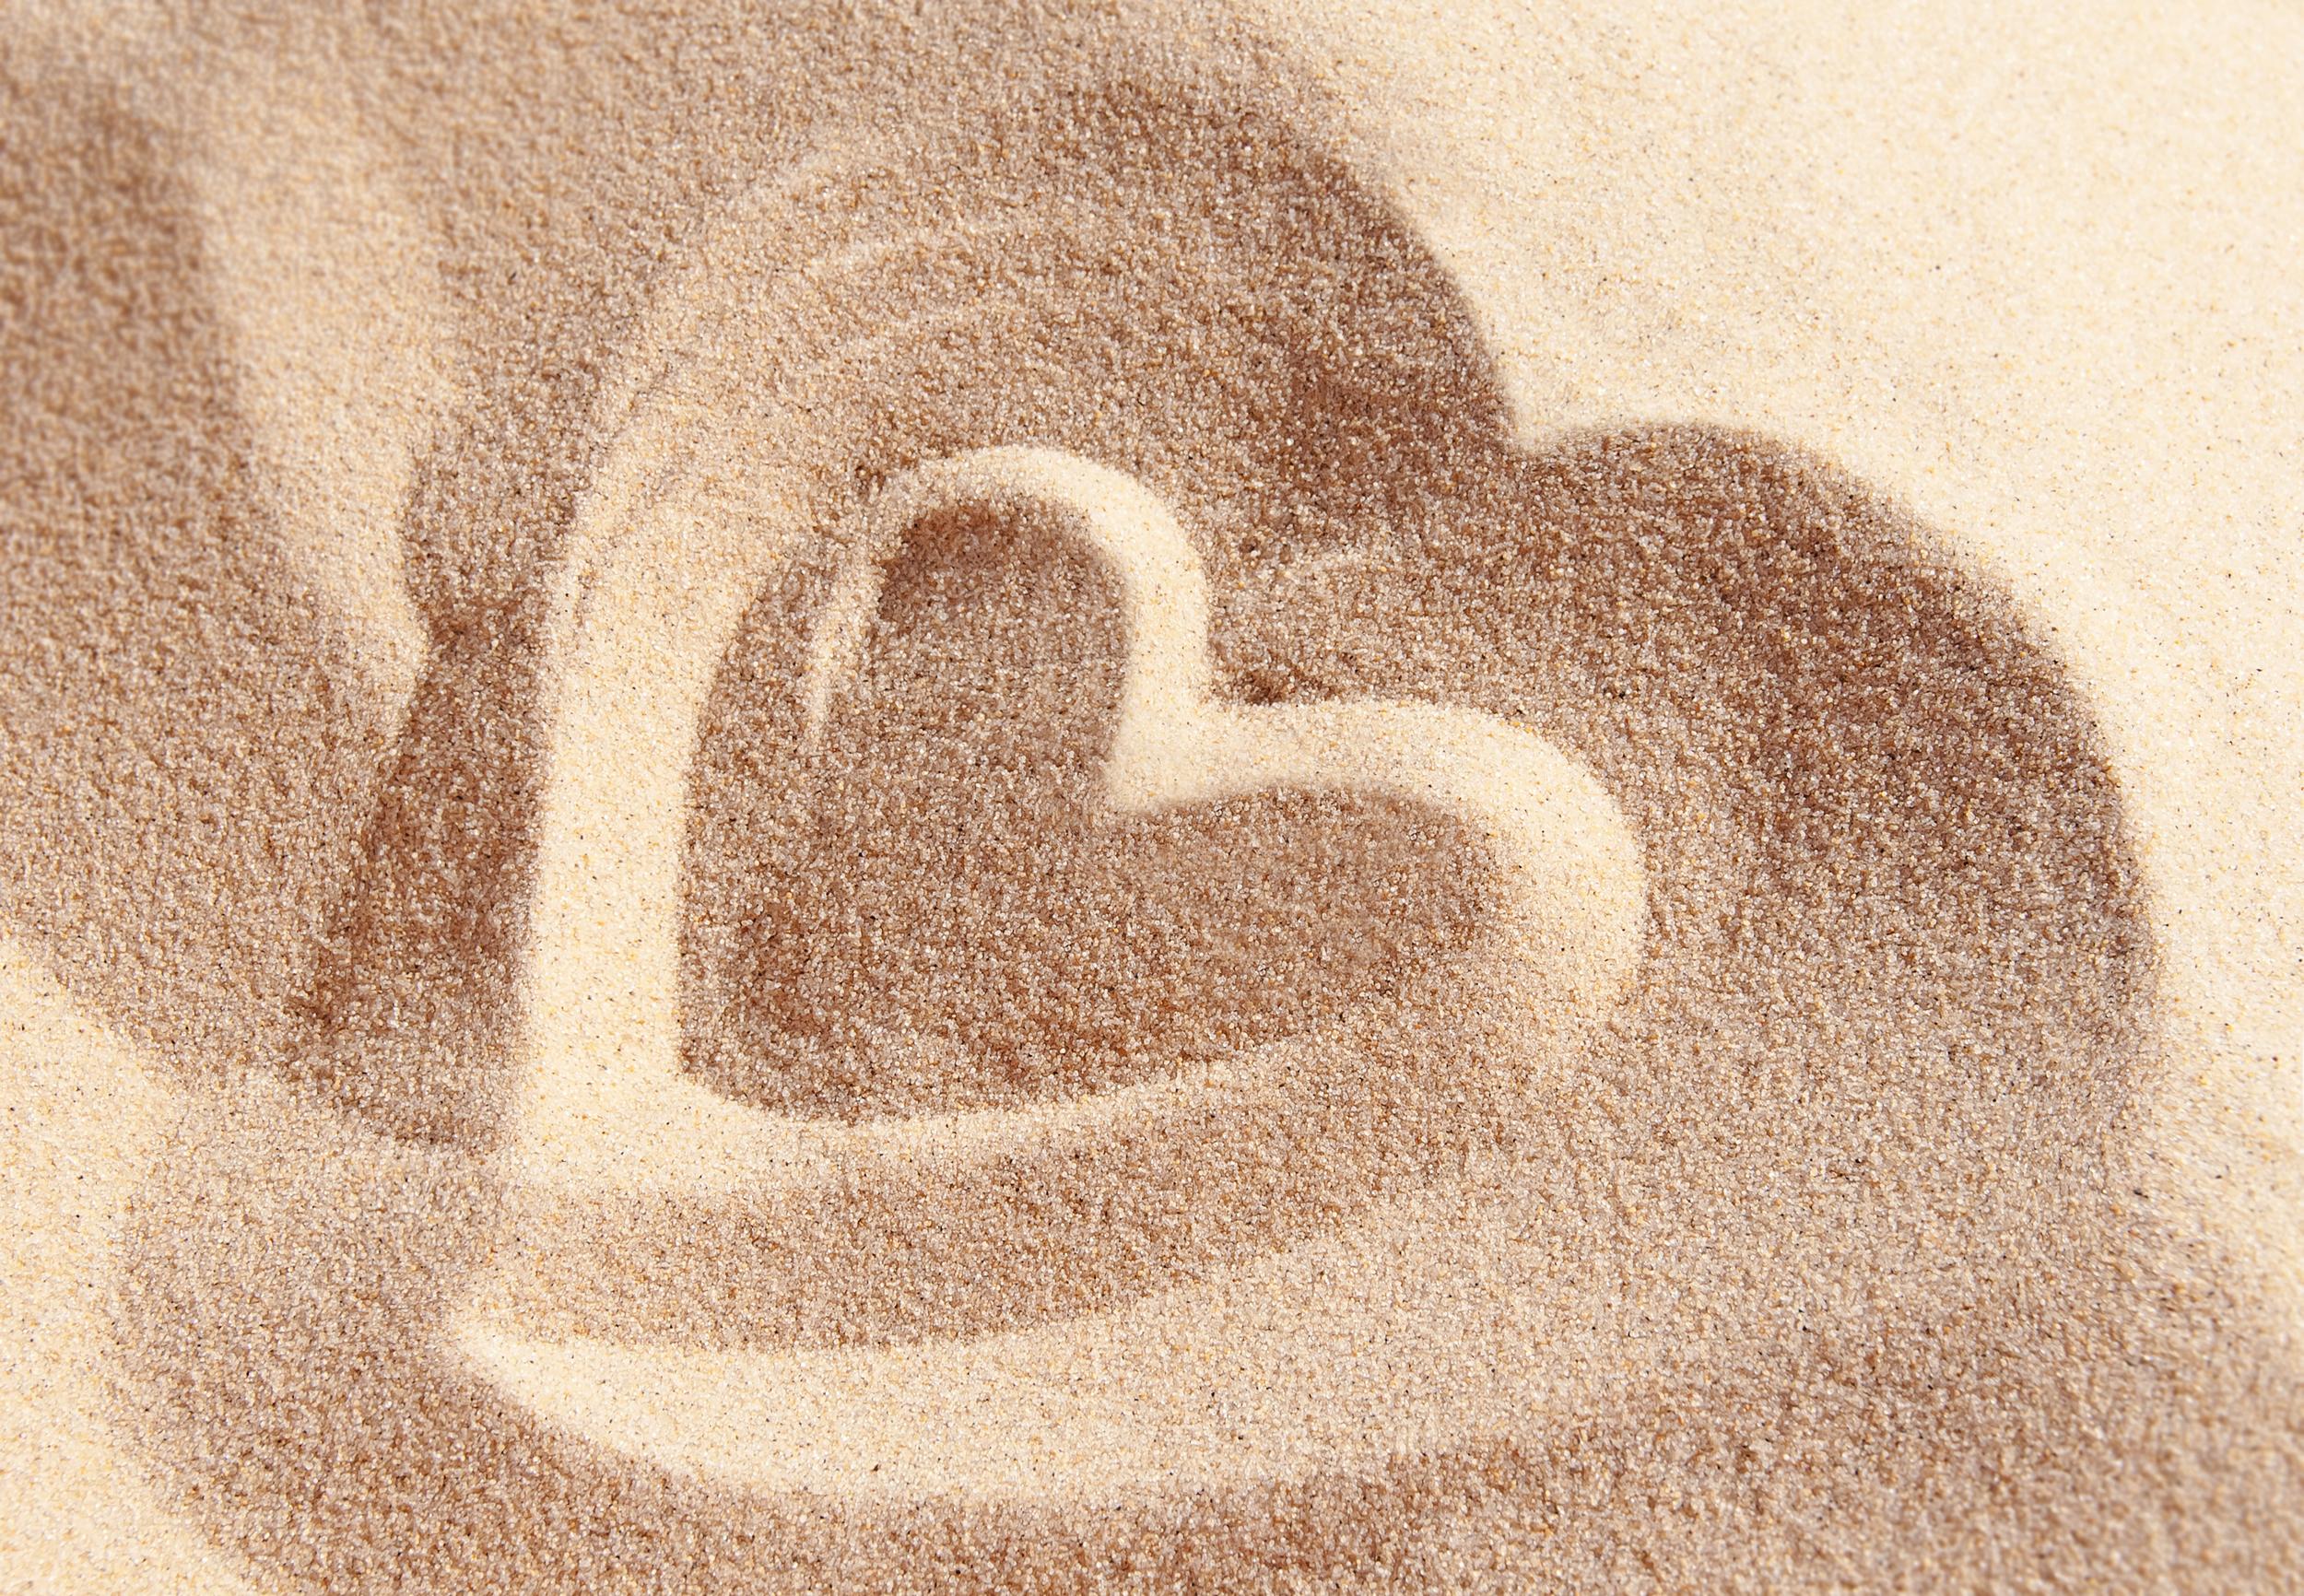 Sandyhearts.jpg